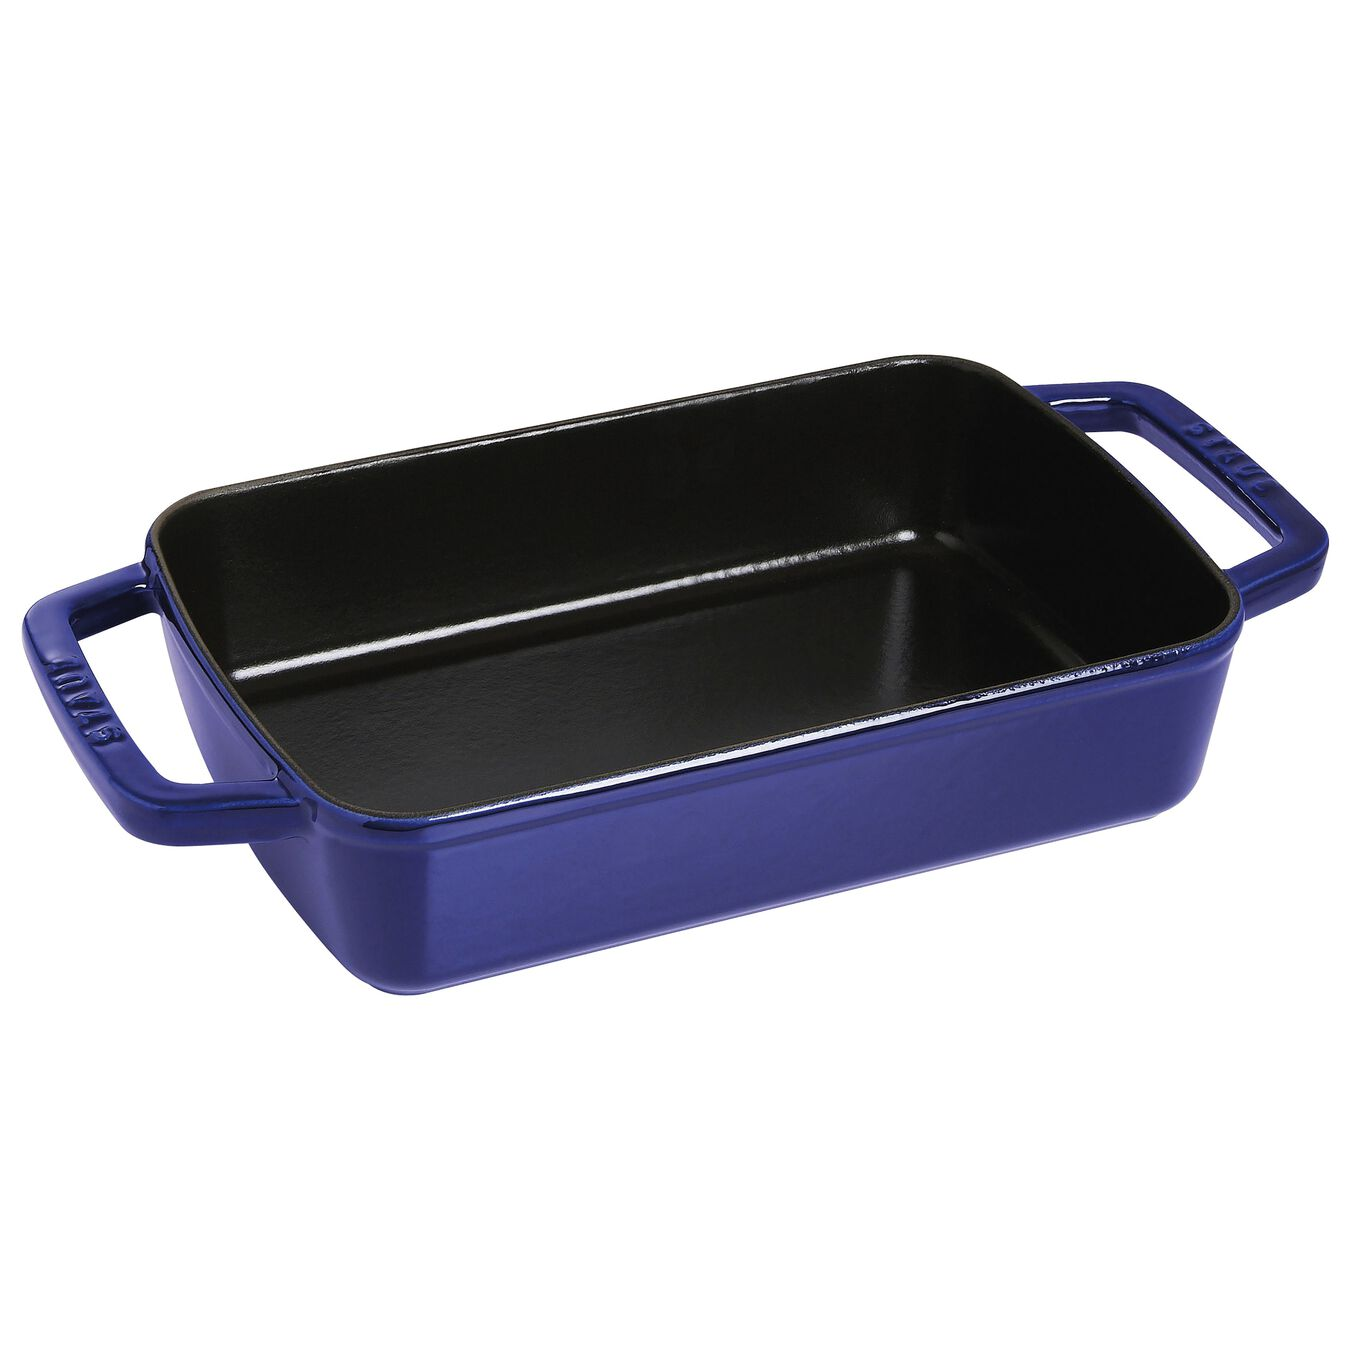 12-inch x 8-inch Roasting Pan - Dark Blue,,large 1